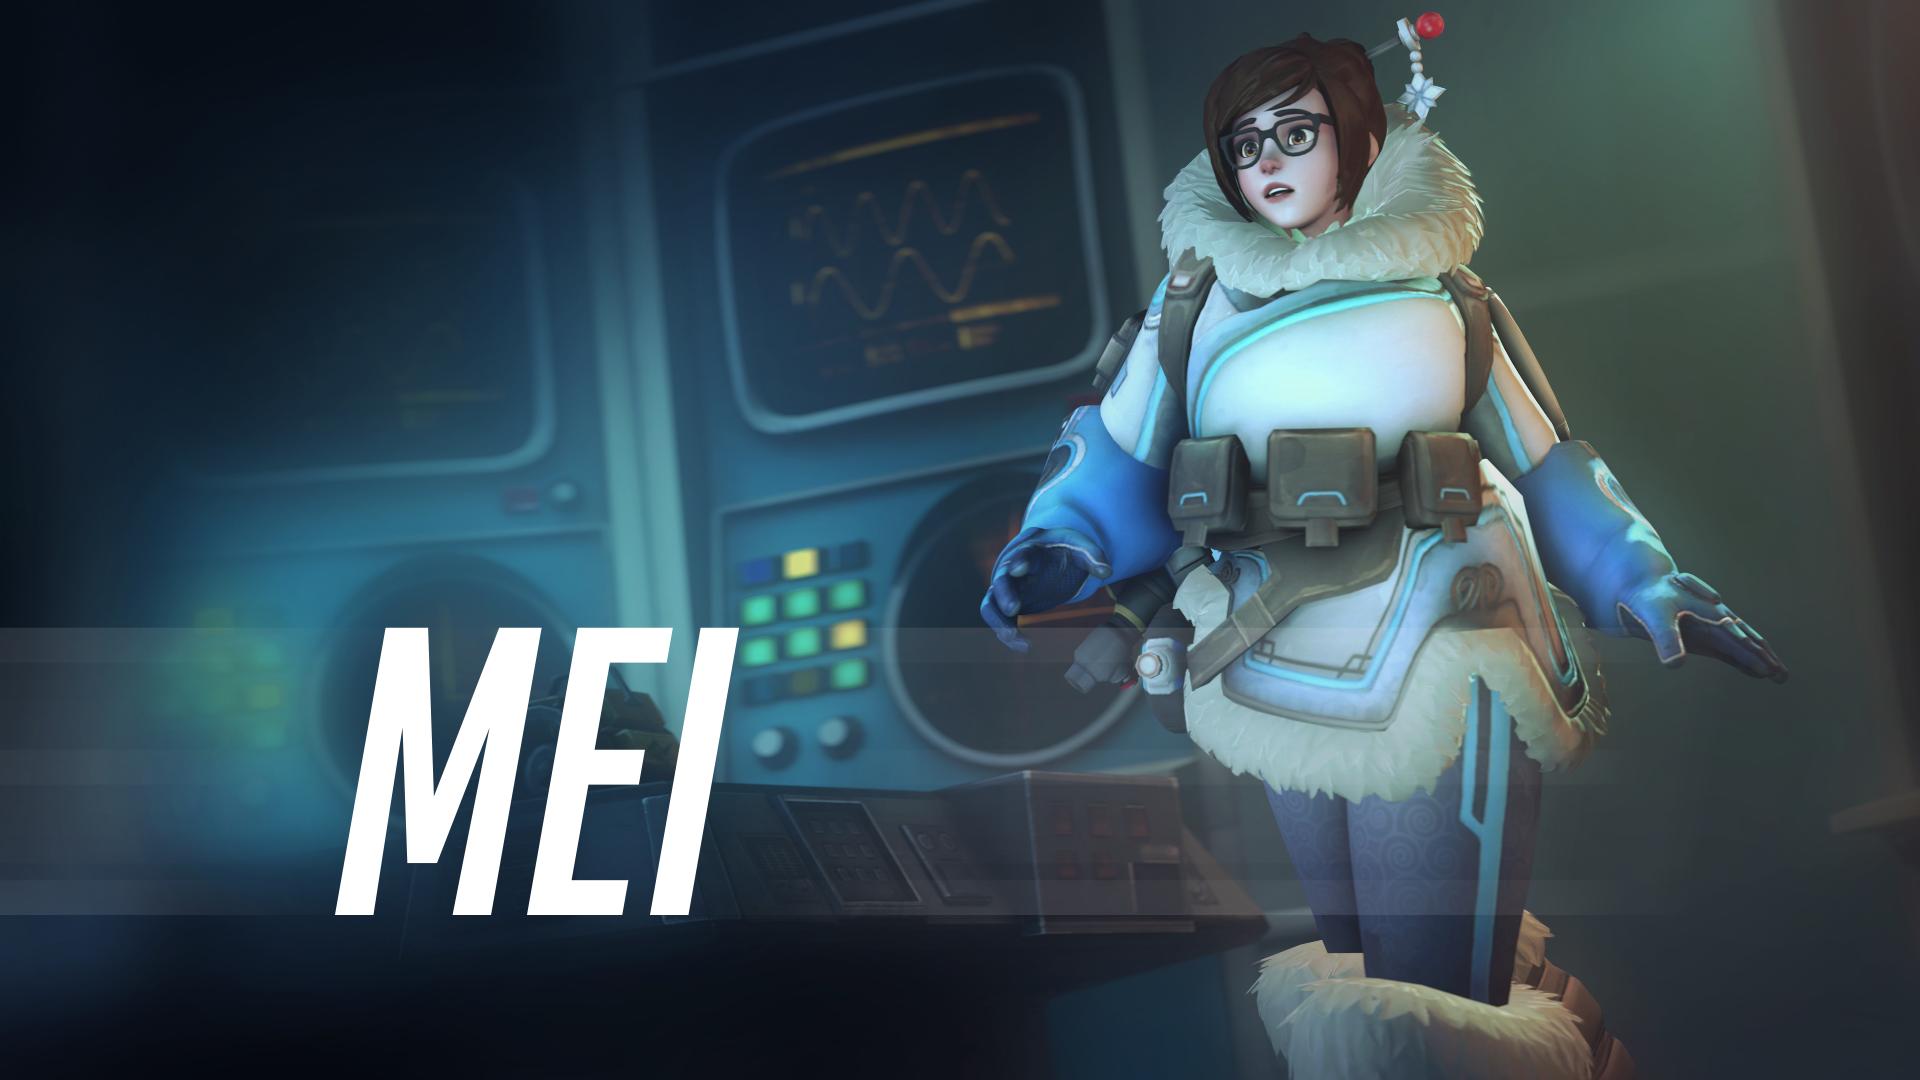 Video Game Overwatch  Mei-Ling Zhou Mei Blizzard Entertainment Wallpaper